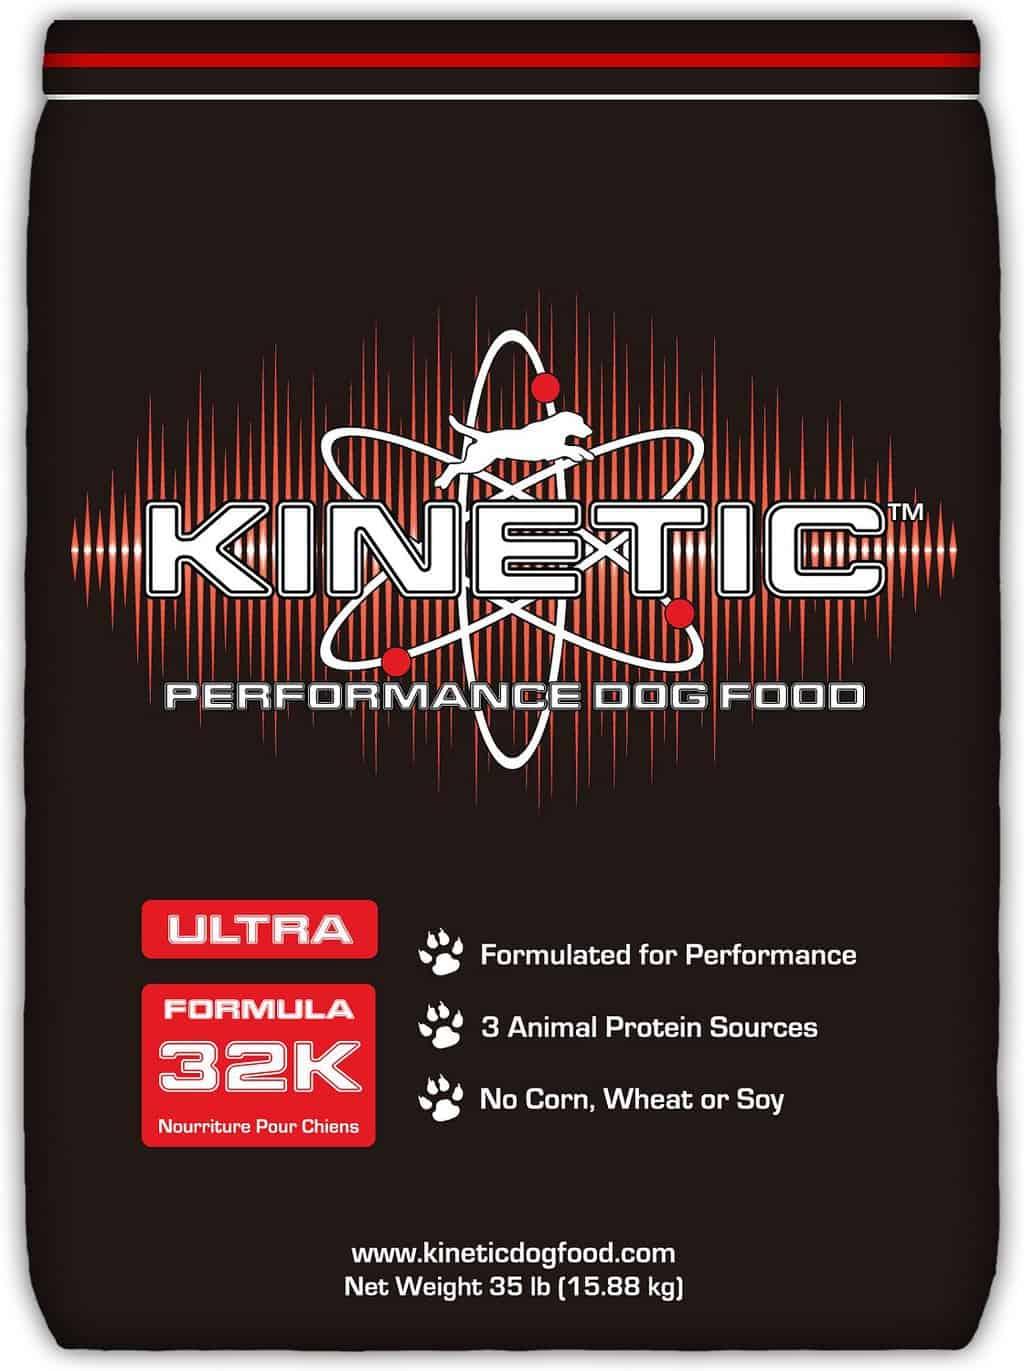 Kinetic Dog Food Reviews, Recalls & Coupons [year] 8